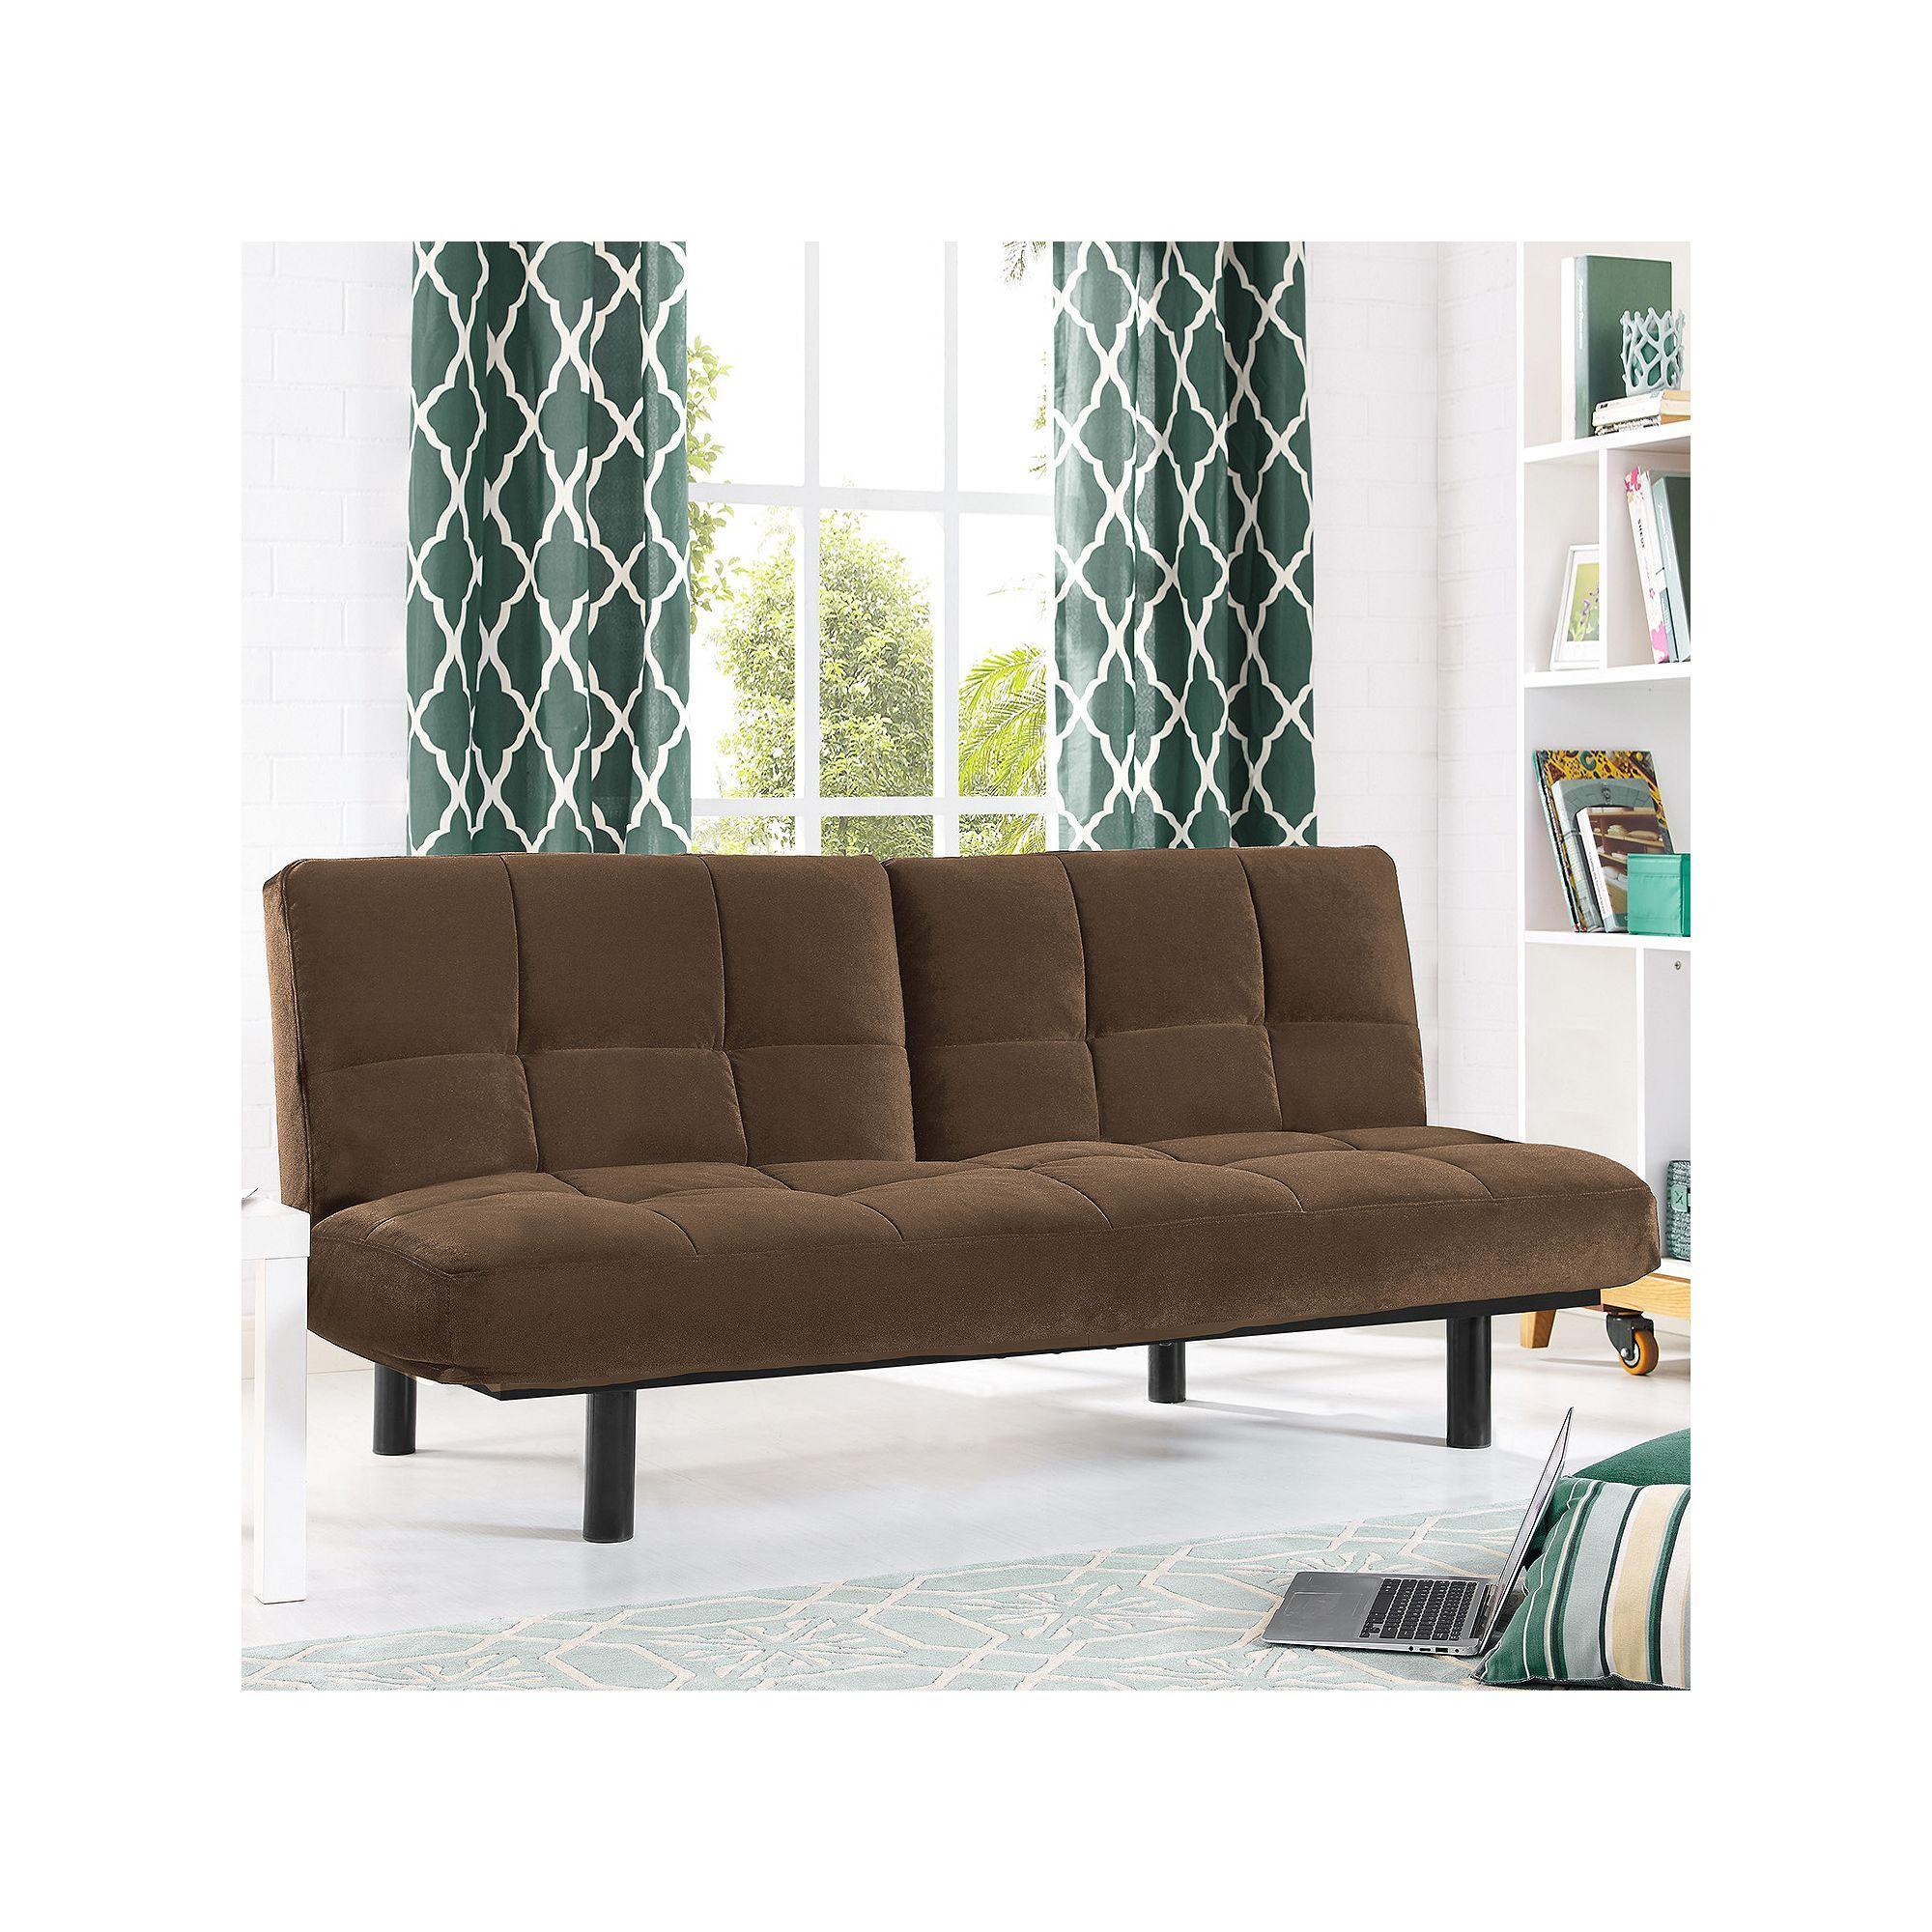 Best Serta Khloe Convertible Futon Sofa Bed Futon Sofa Bed 400 x 300